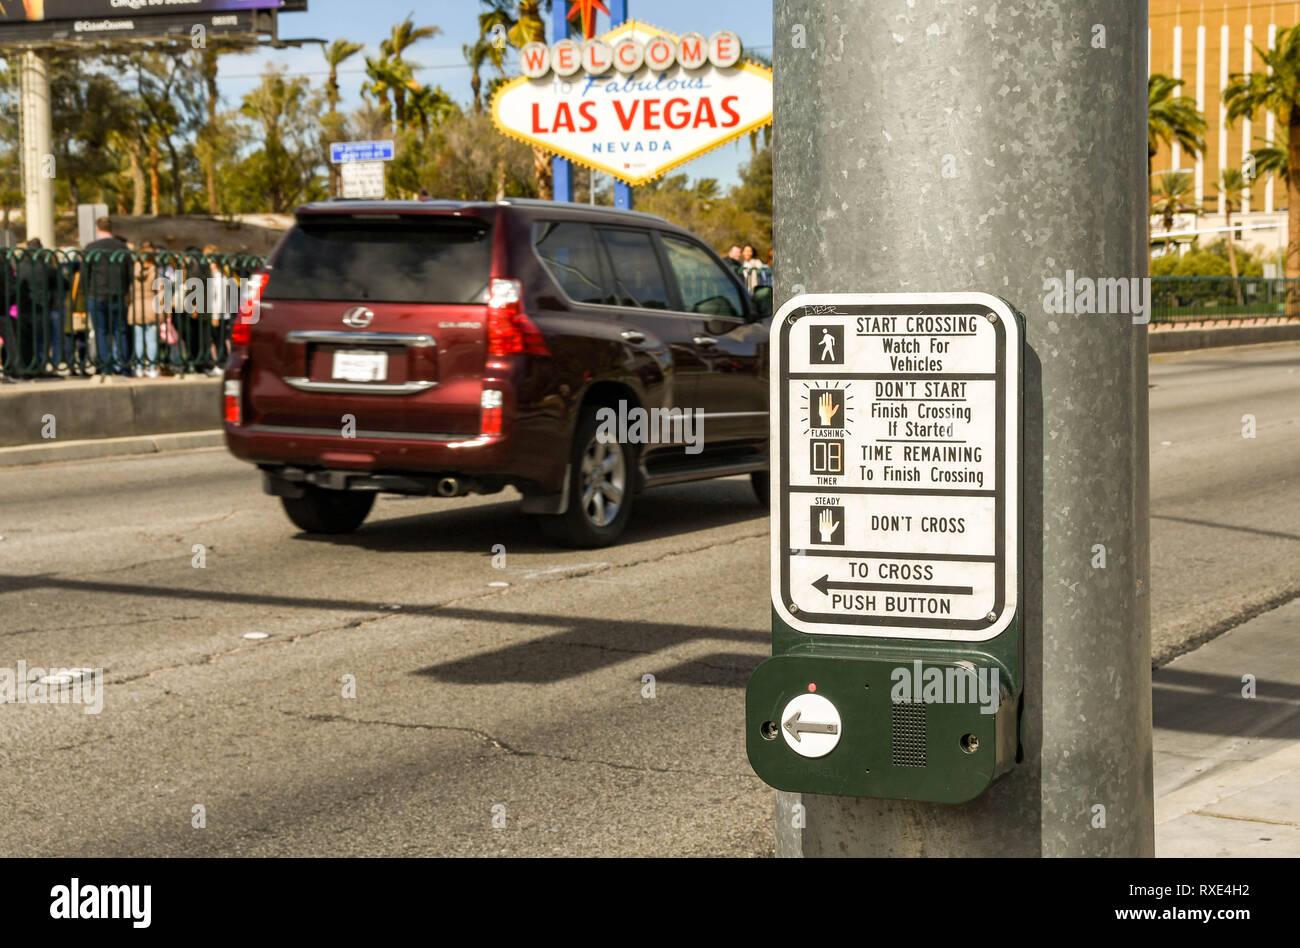 LAS VEGAS, NV, USA - FEBRUARY 2019: Push button operating panel for a pedestrian road crossing on Las Vegas Boulevard. - Stock Image